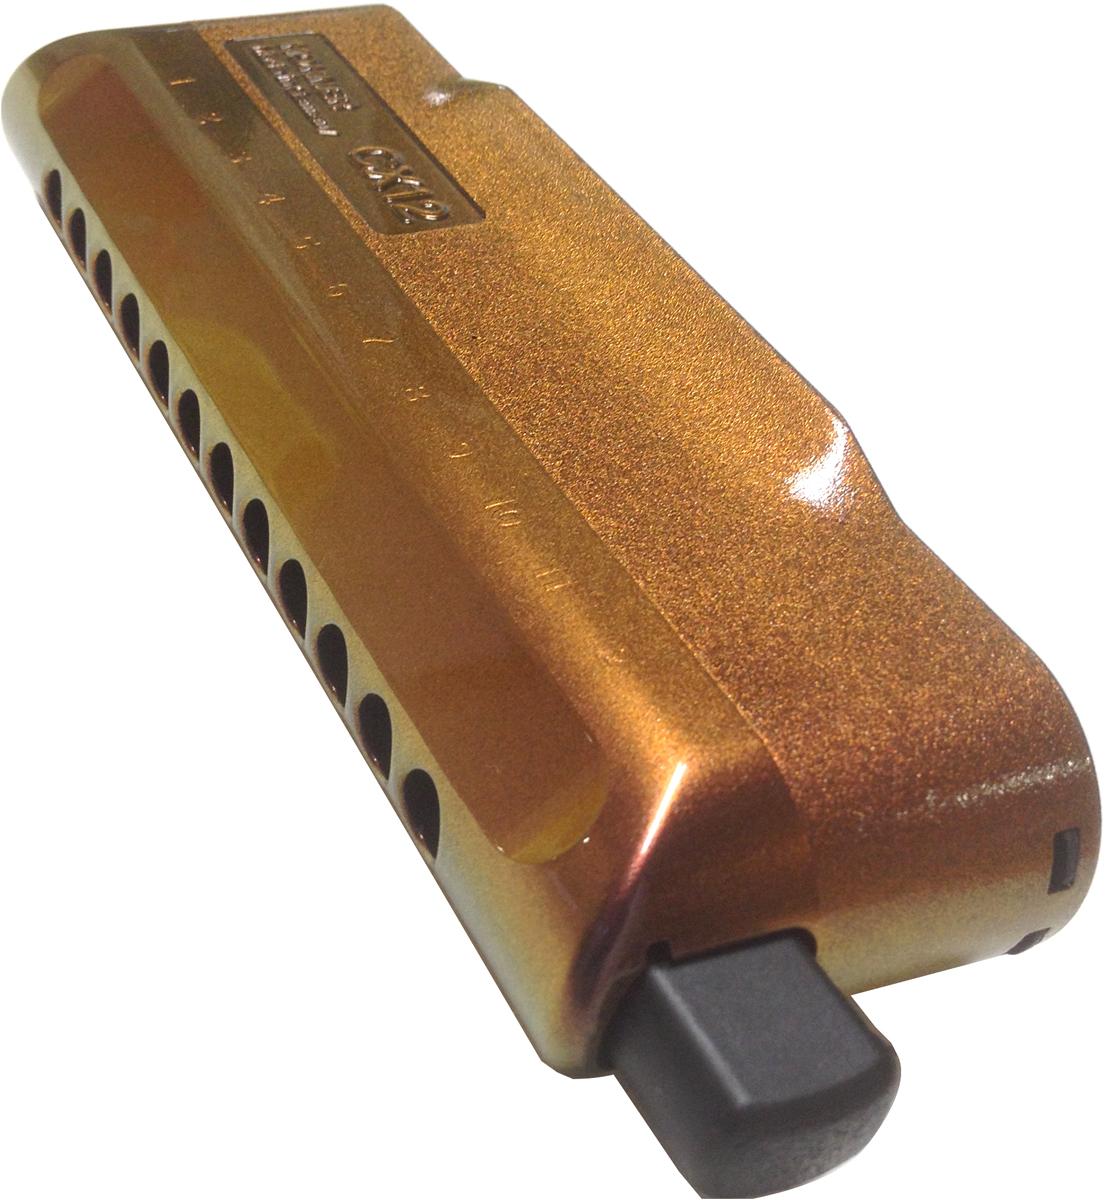 HOHNER ジャズ ( ホーナー ) CX12 JAZZ ジャズ スライド式 C調 CX-12 7546/48 クロマチックハーモニカ 12穴 スライド式 3オクターブ アッセンブリー 分解 CX-12 楽器 ハーモニカ 北海道/沖縄/離島不可=送料実費請求, 正規品販売!:f9cd27d0 --- debyn.com